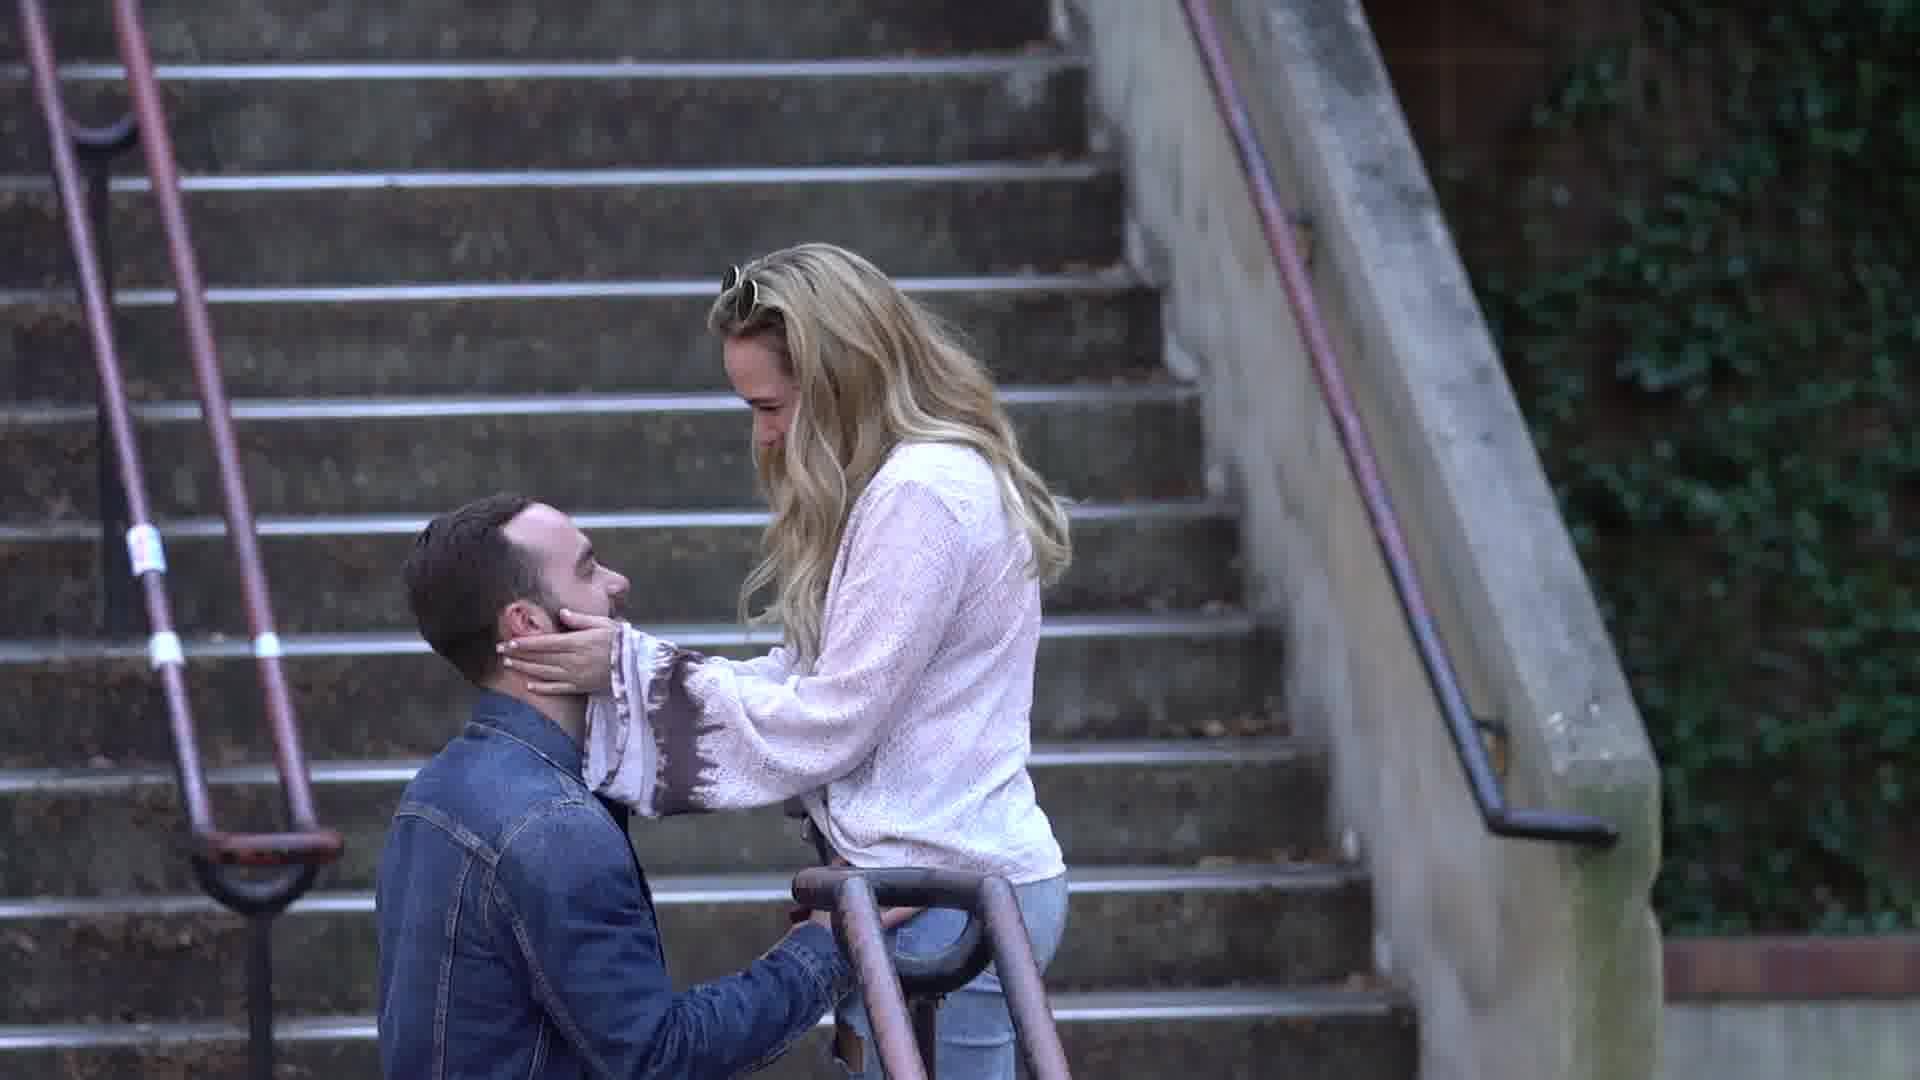 Ryan + Morgan - The Proposal